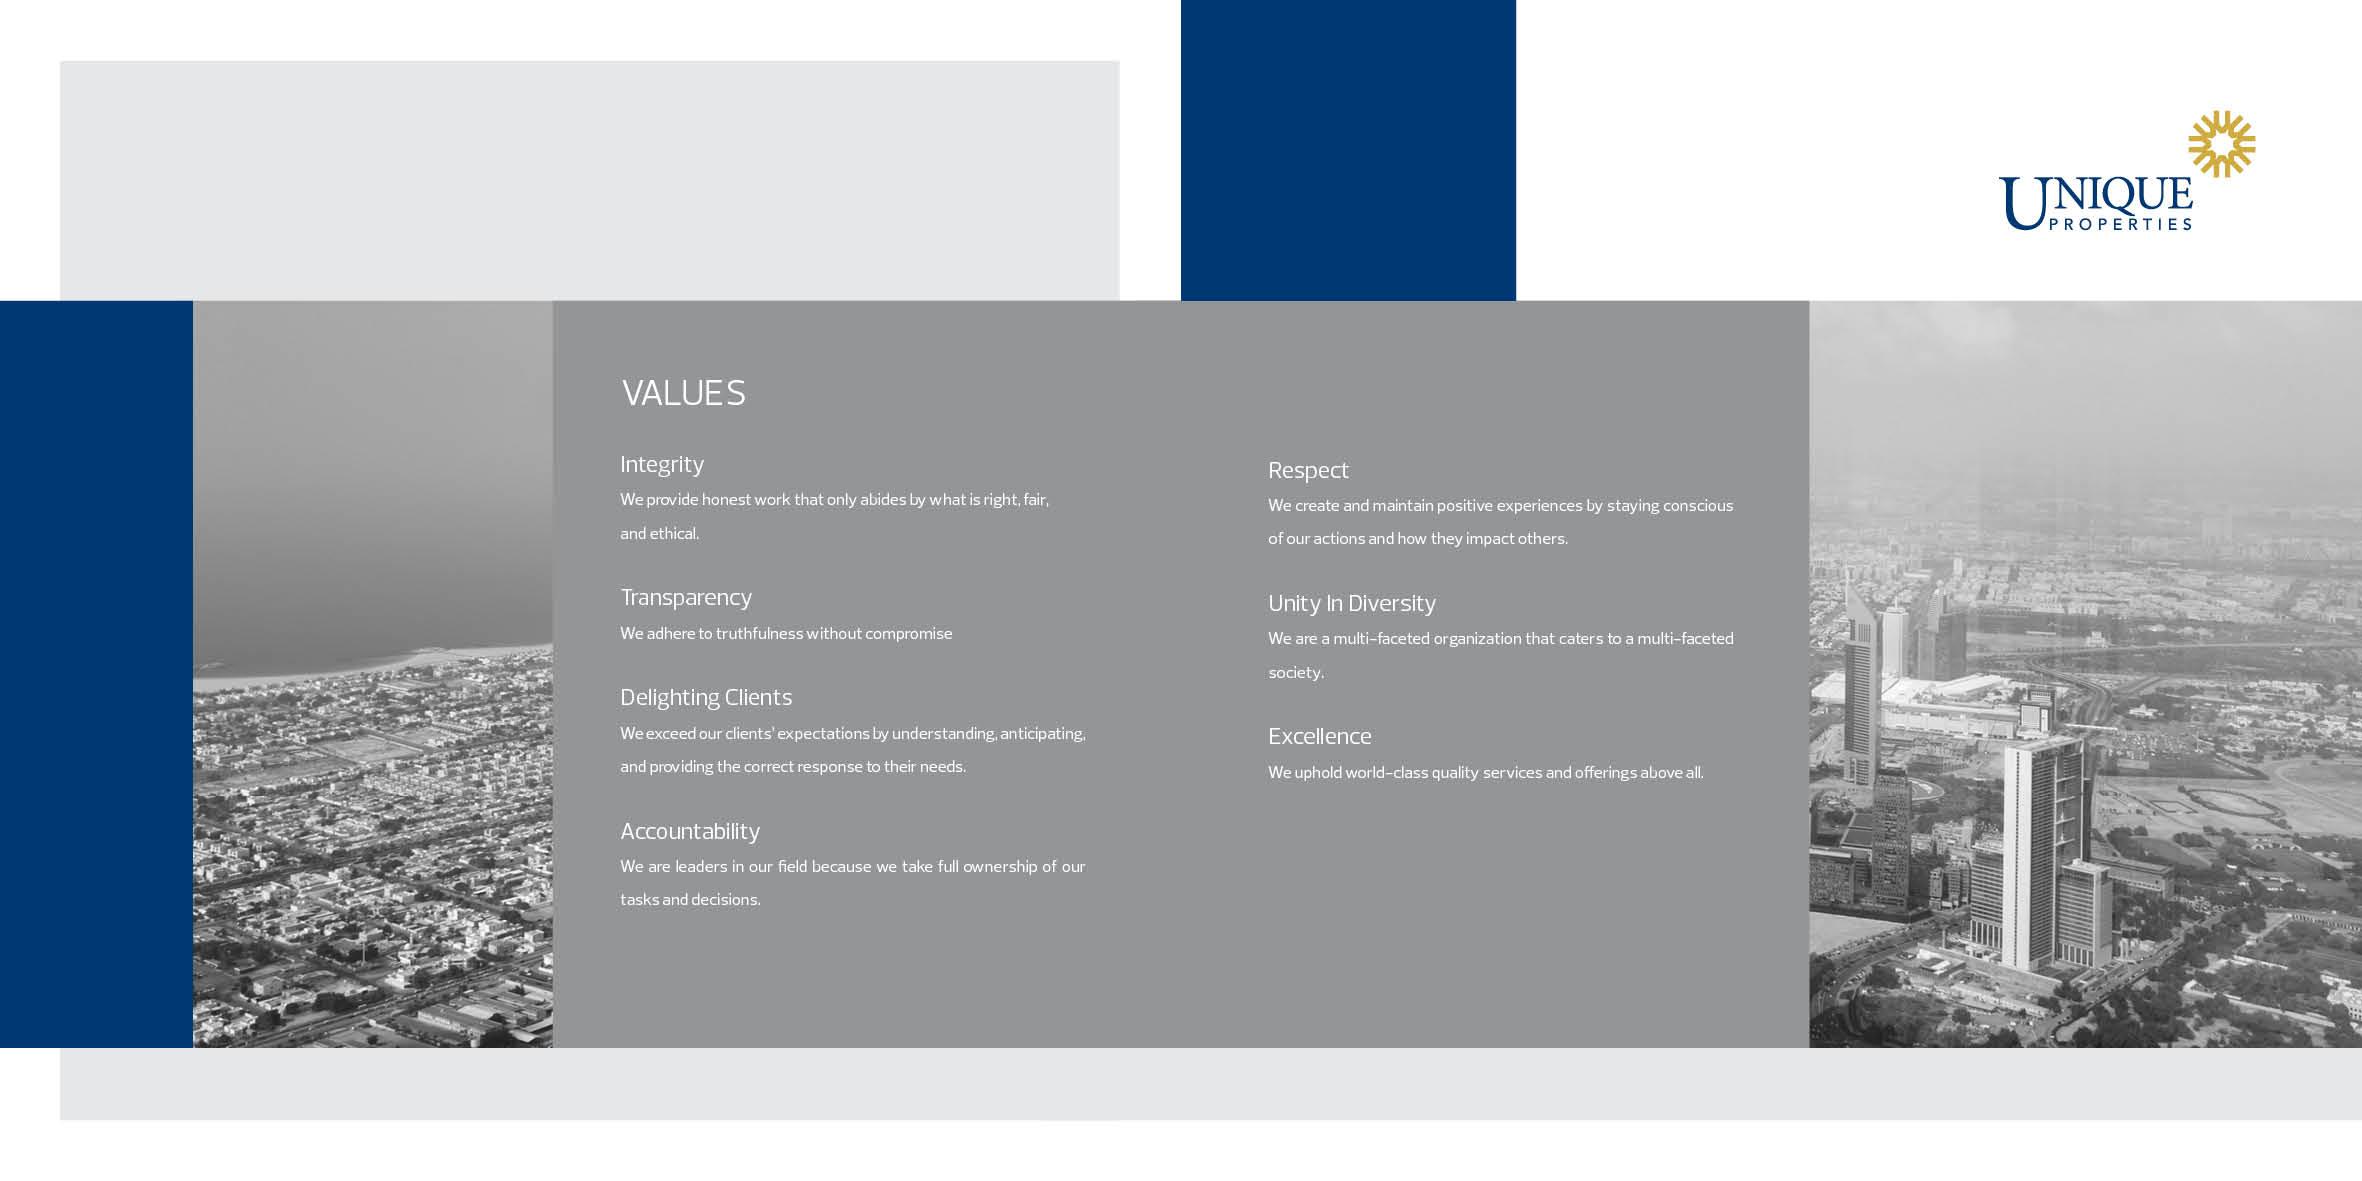 Unique Properties_Inside pages4.jpg